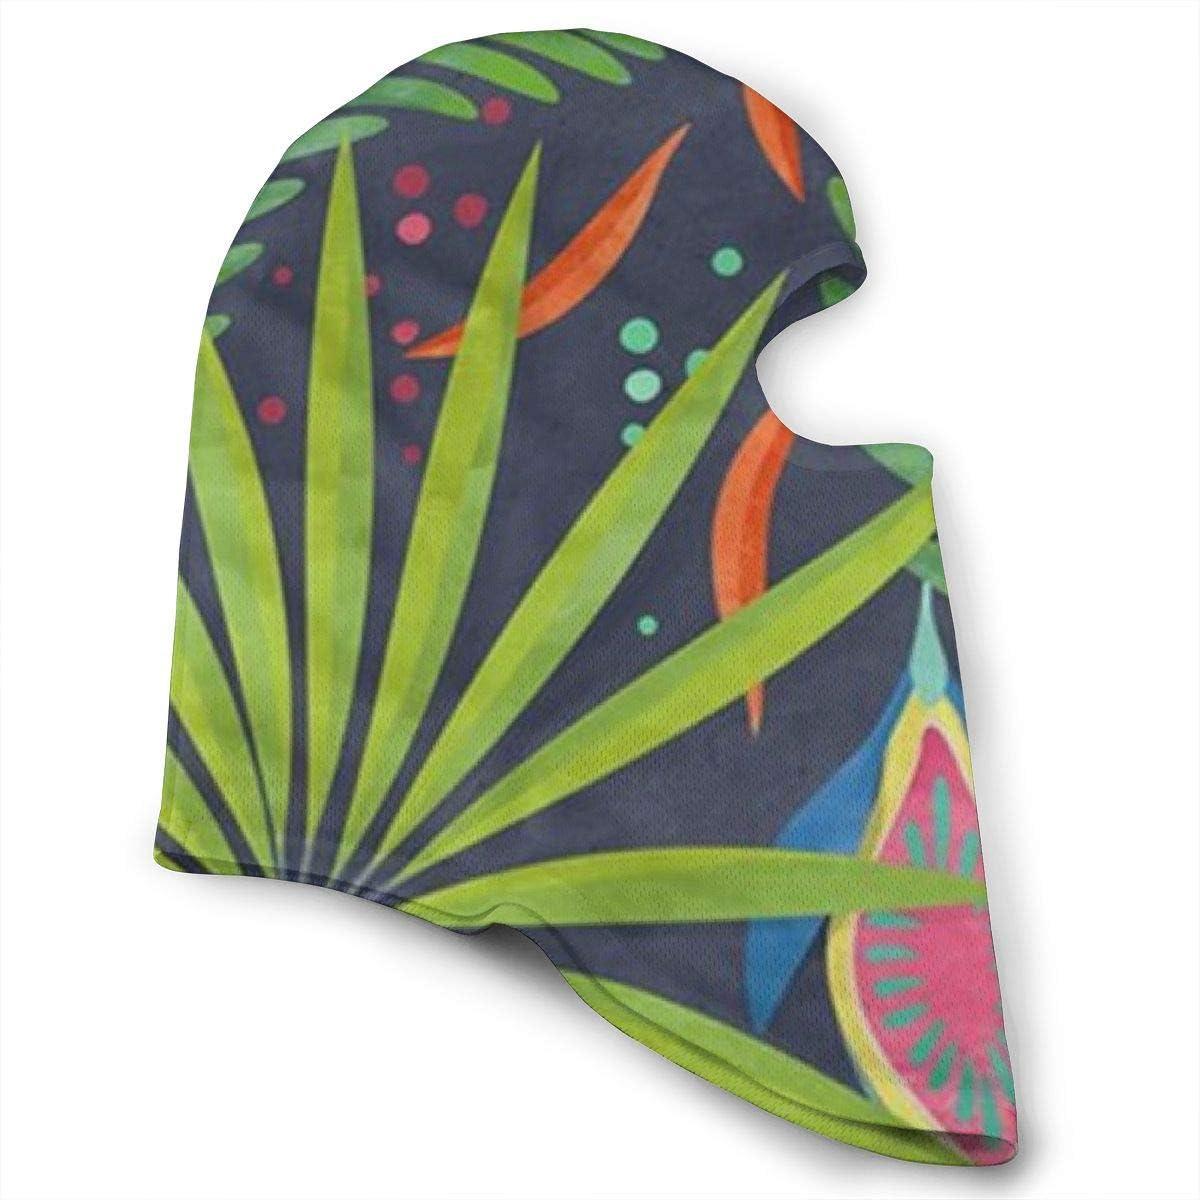 CAClifestyle Tropical Fruits Unisex Windproof Balaclavas Full Face Mask Hood